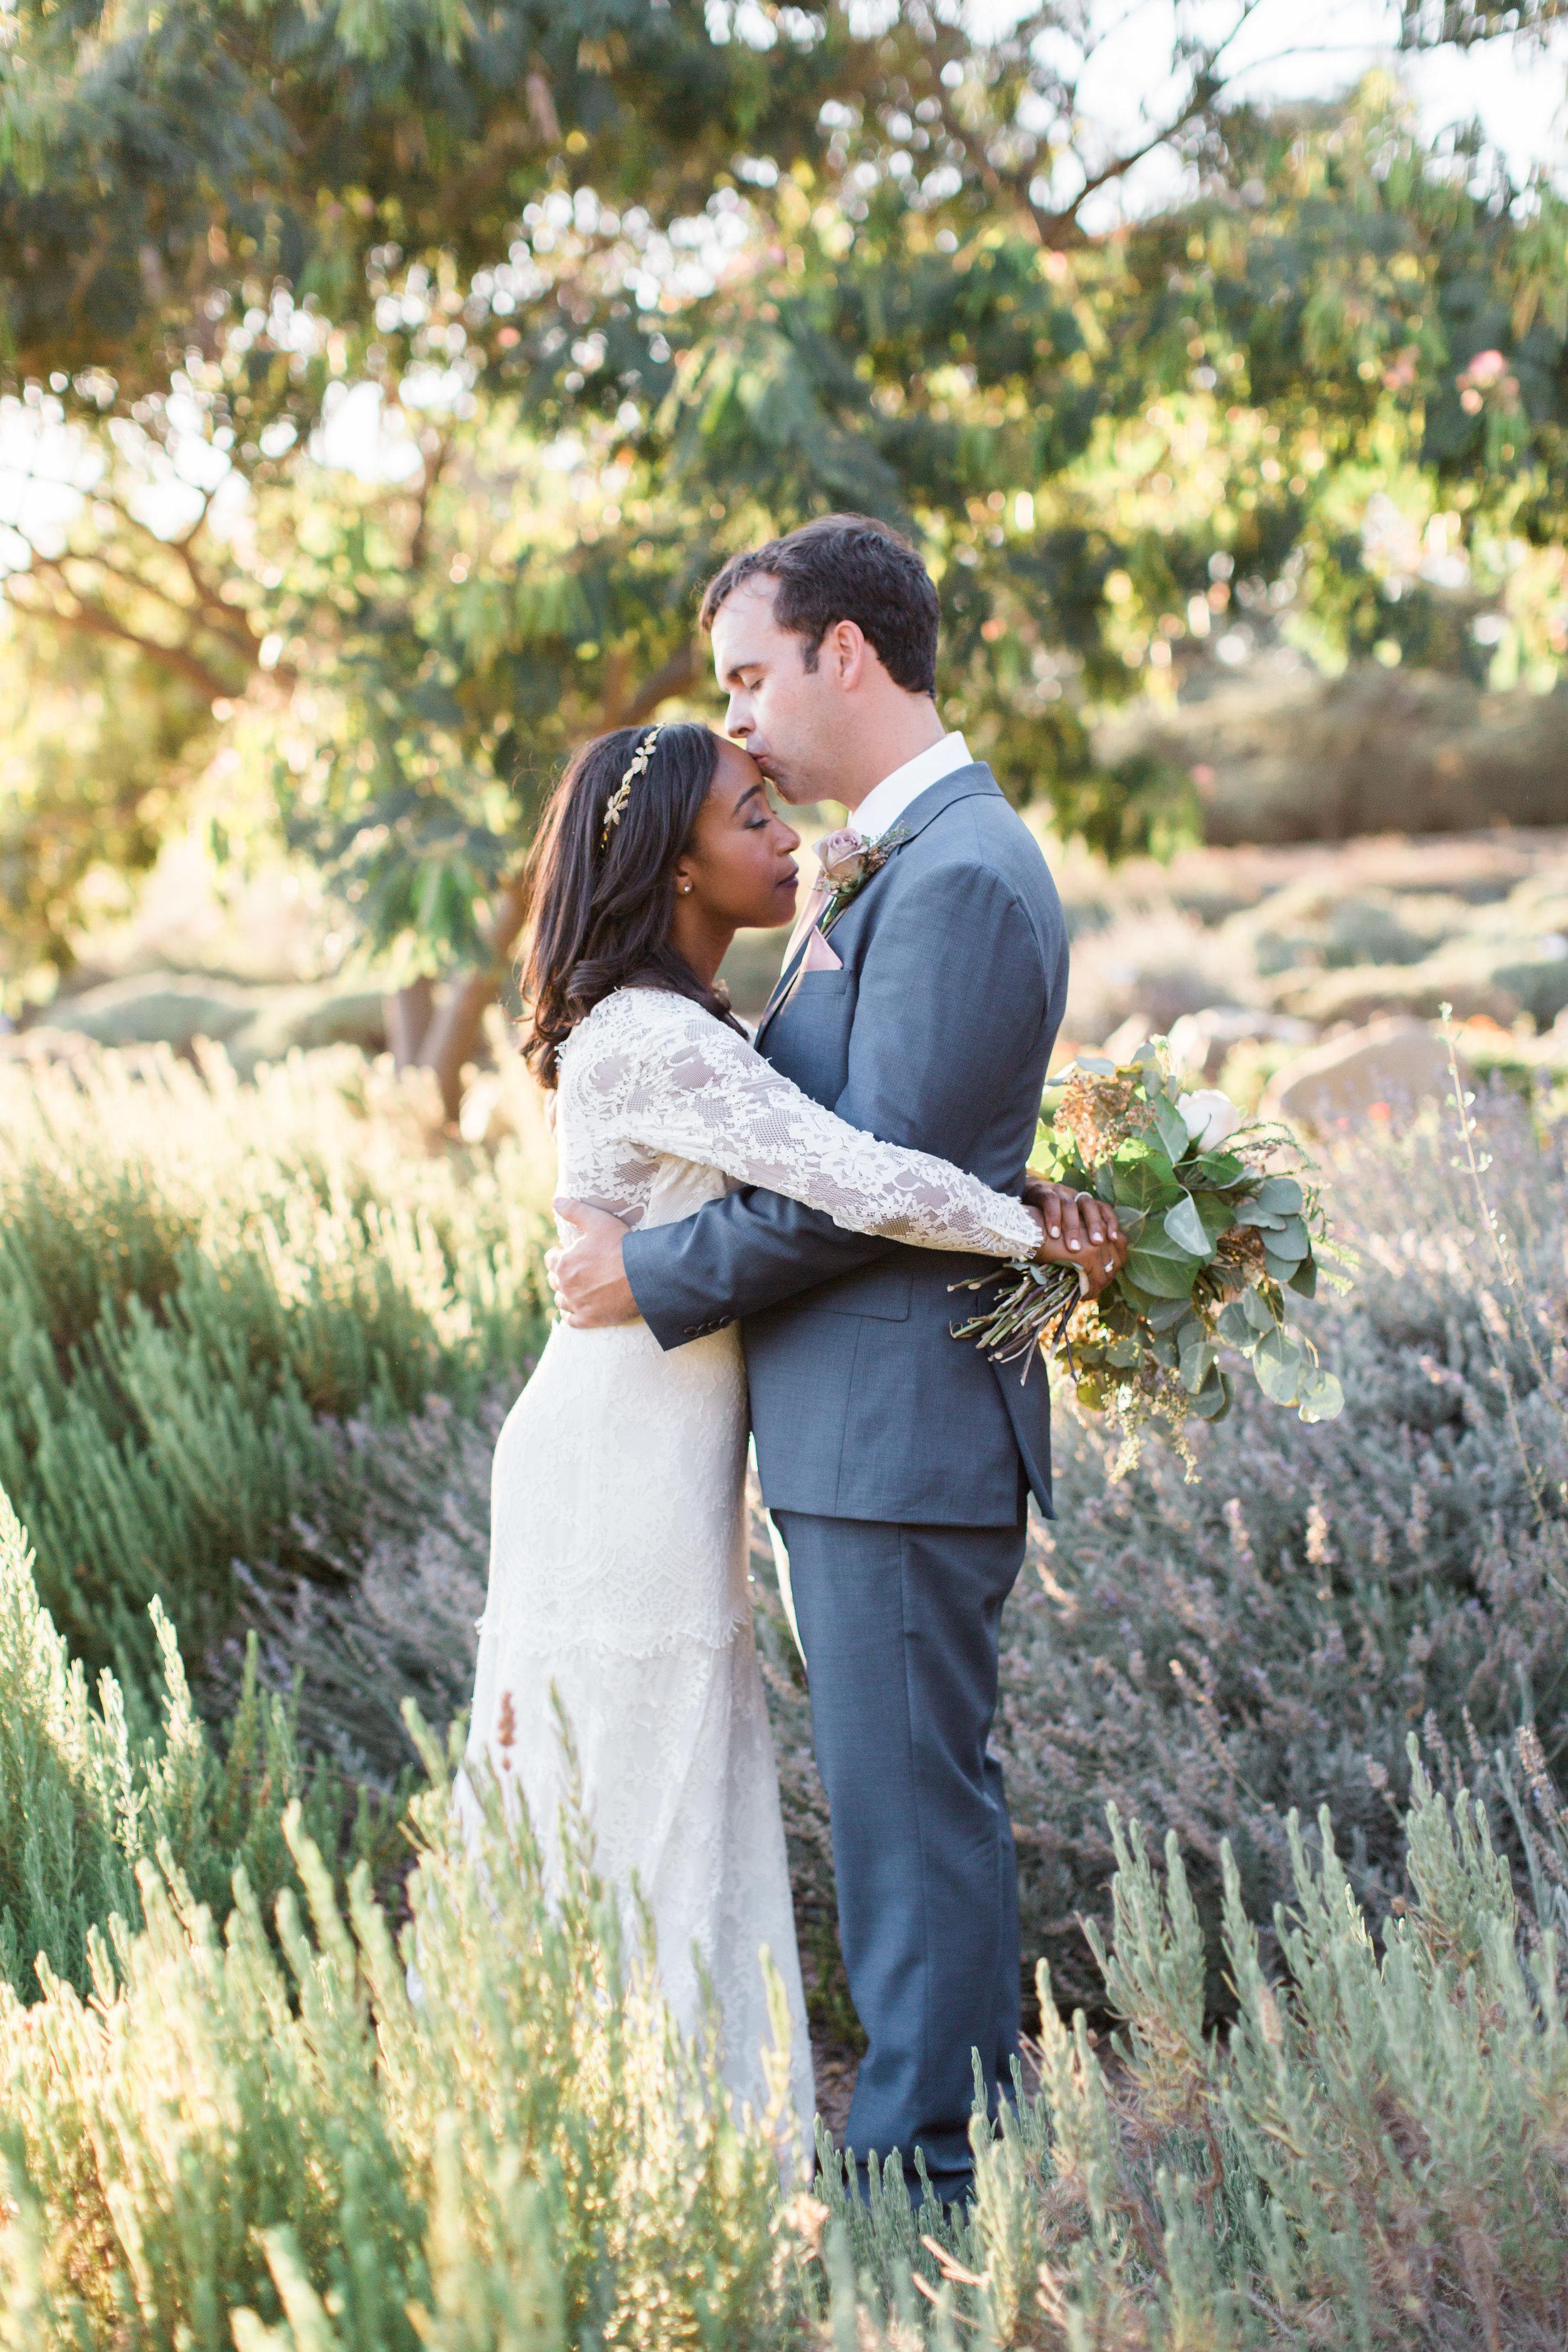 Jenny Quicksall Photography_www.jennyquicksall.com_California Wedding Photographer_Highland Springs Ranch and Inn Resort_Cherry Valley California (51).JPG